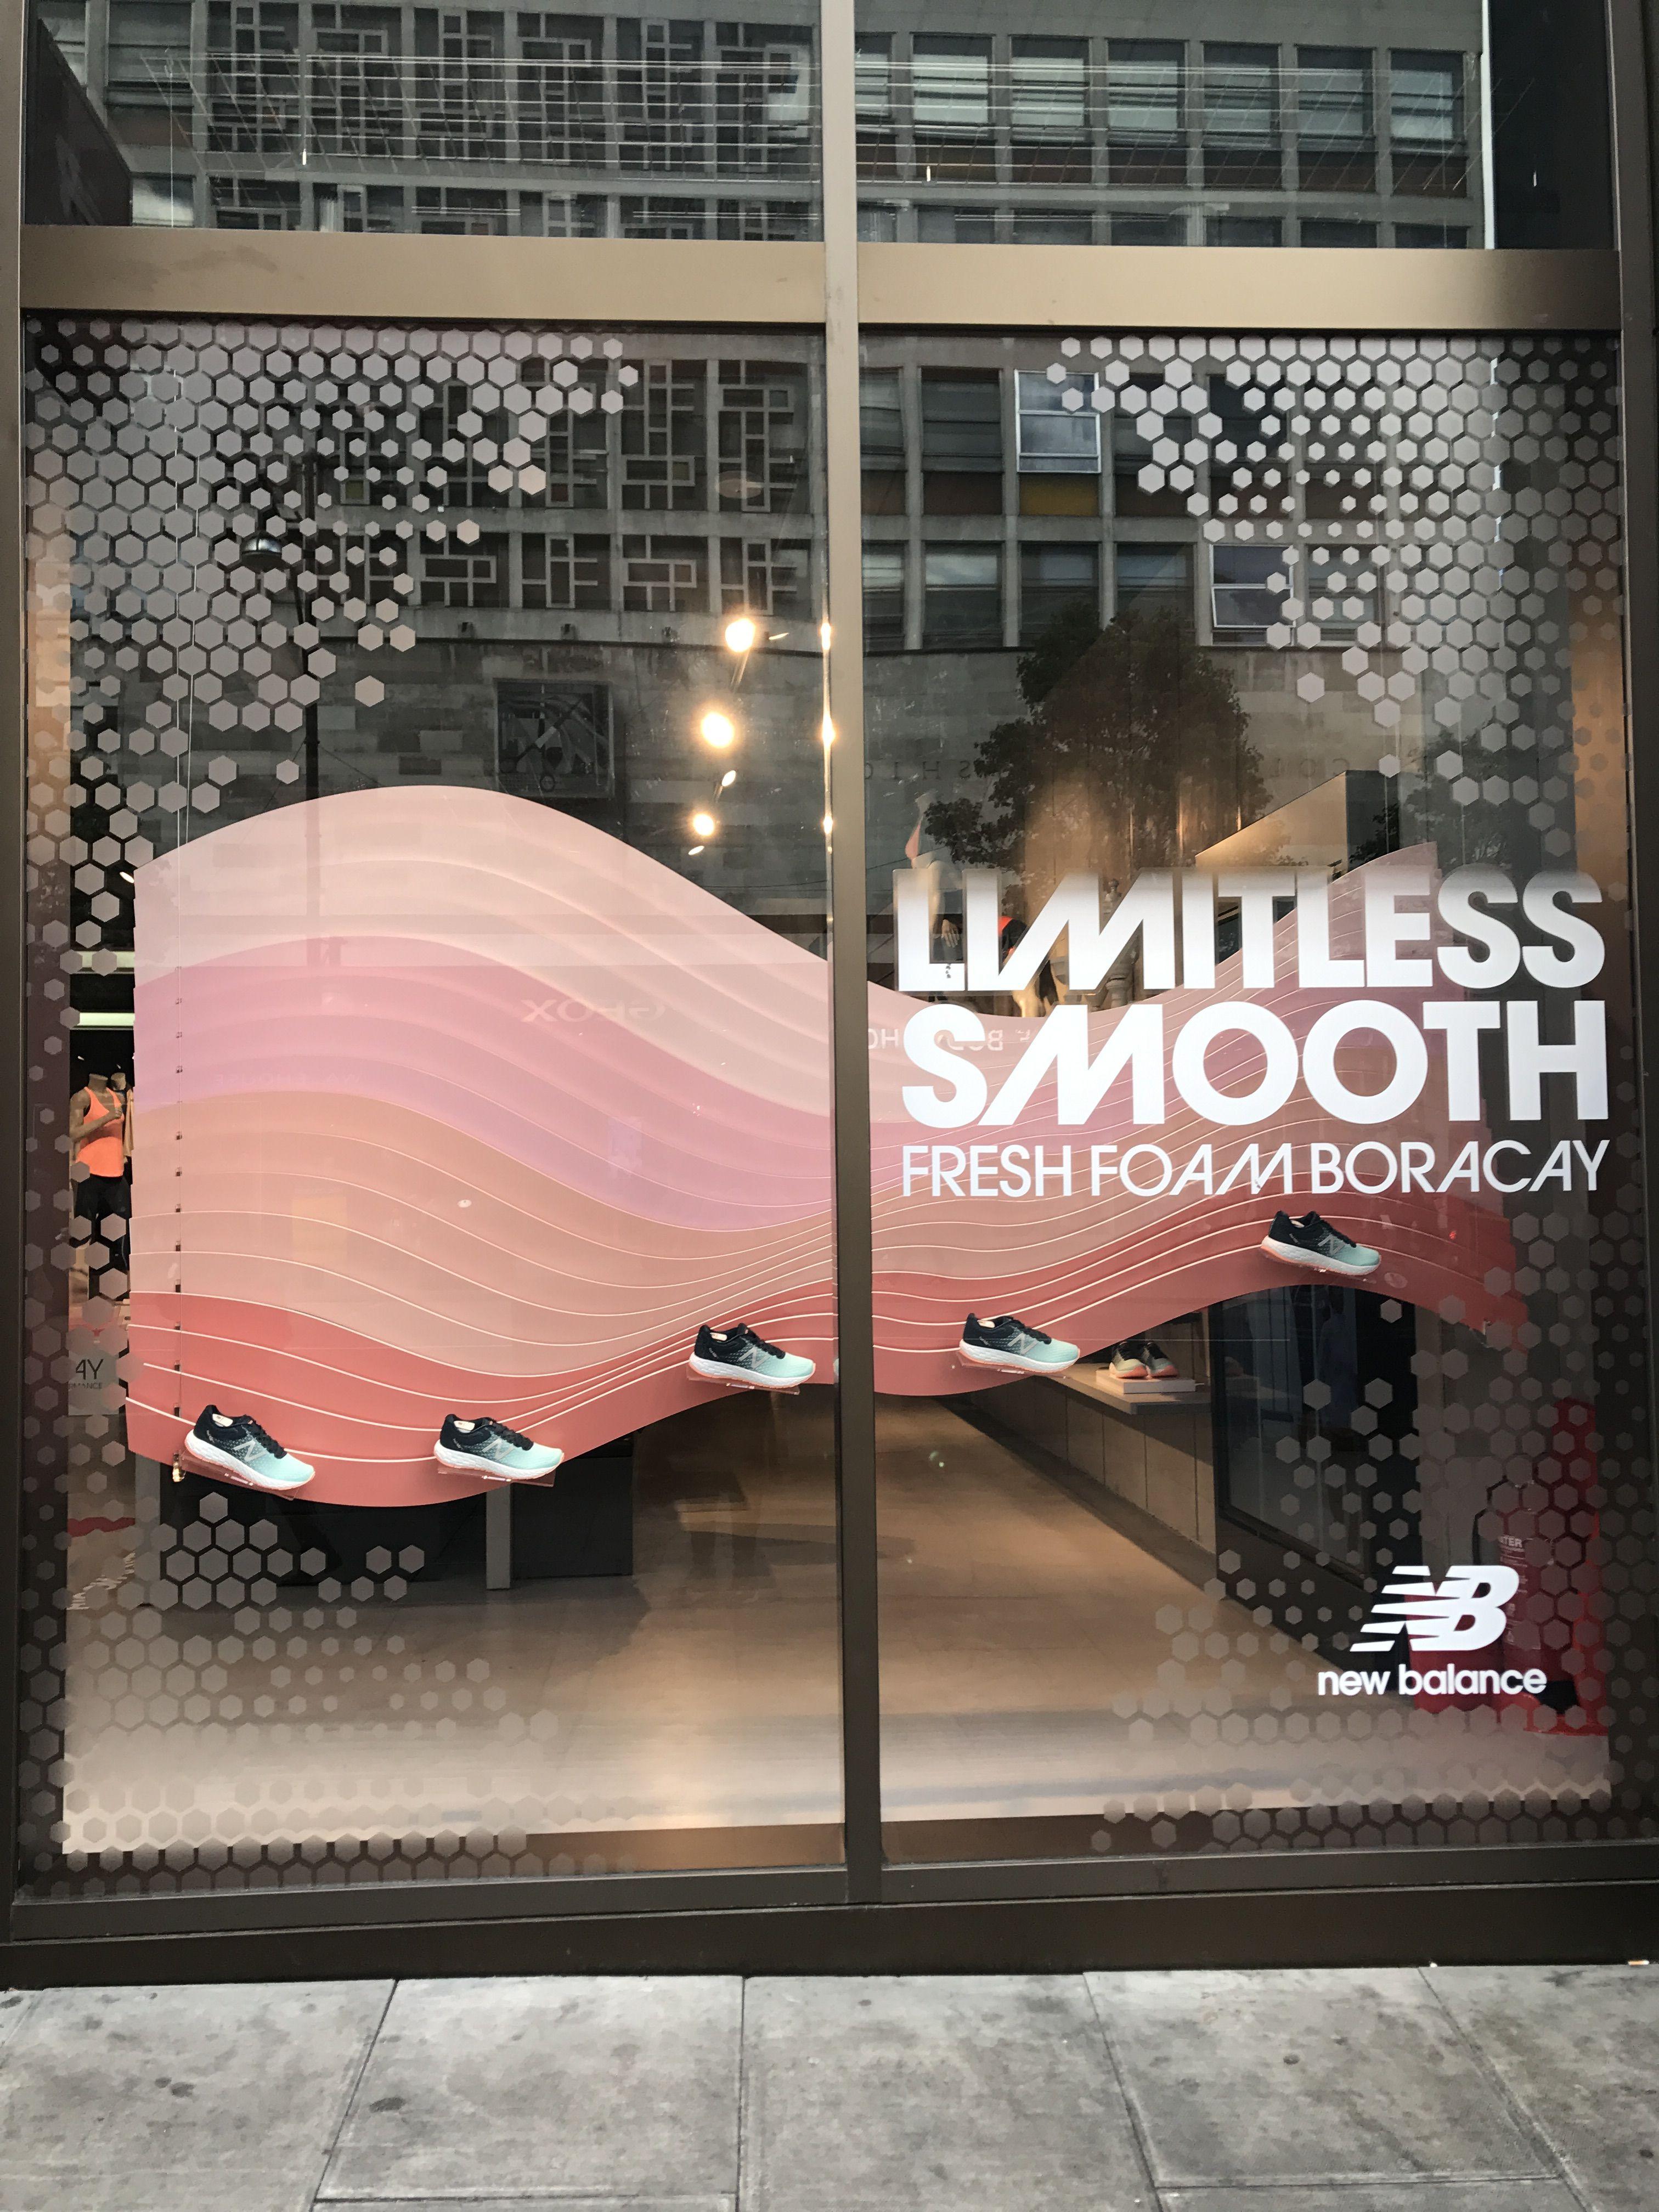 e9e91a56e8 New Balance - Central London, April 2017 #window #sportbrands #retail #vm  #visualmerchandising #newbalance